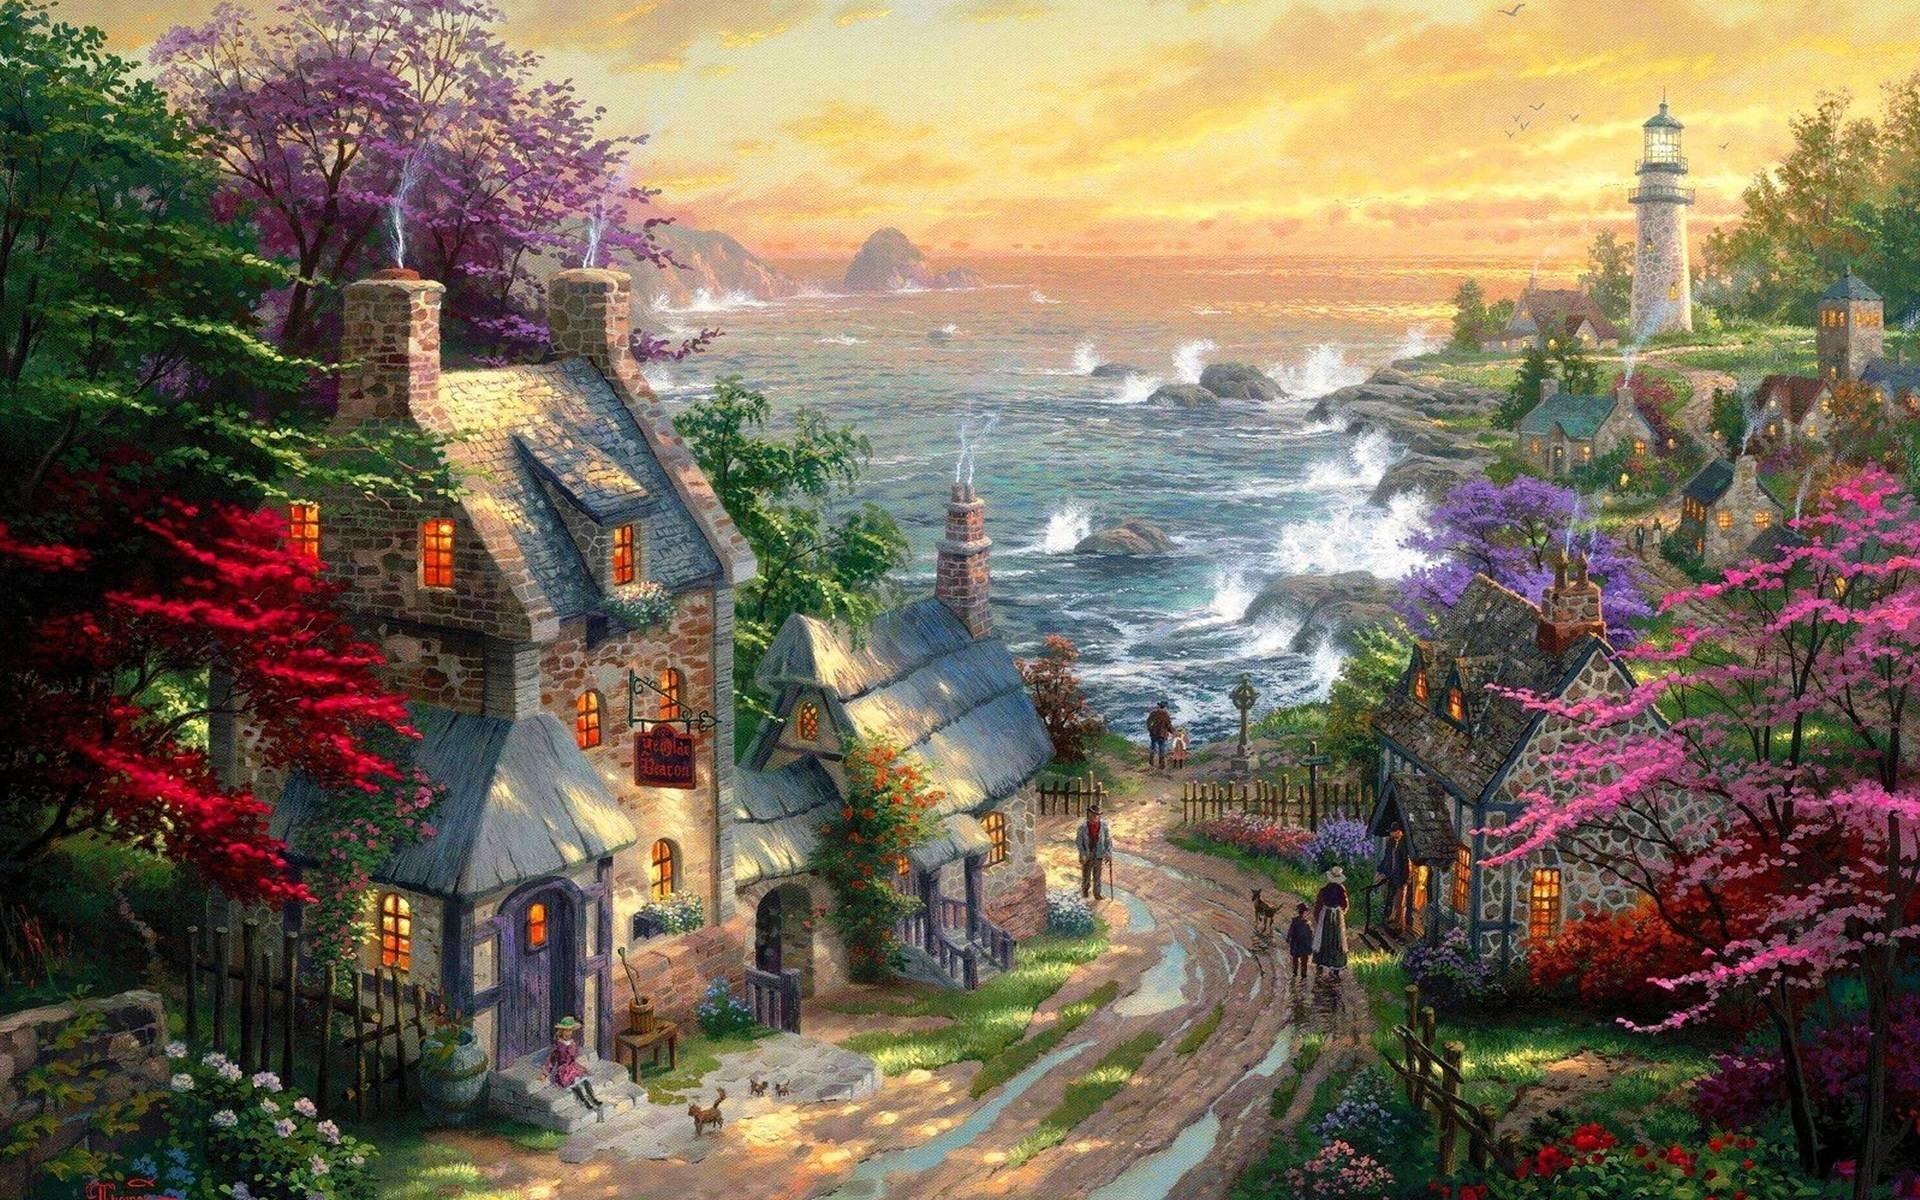 Wallpapers For > Thomas Kinkade Disney Dreams Collection Wallpaper